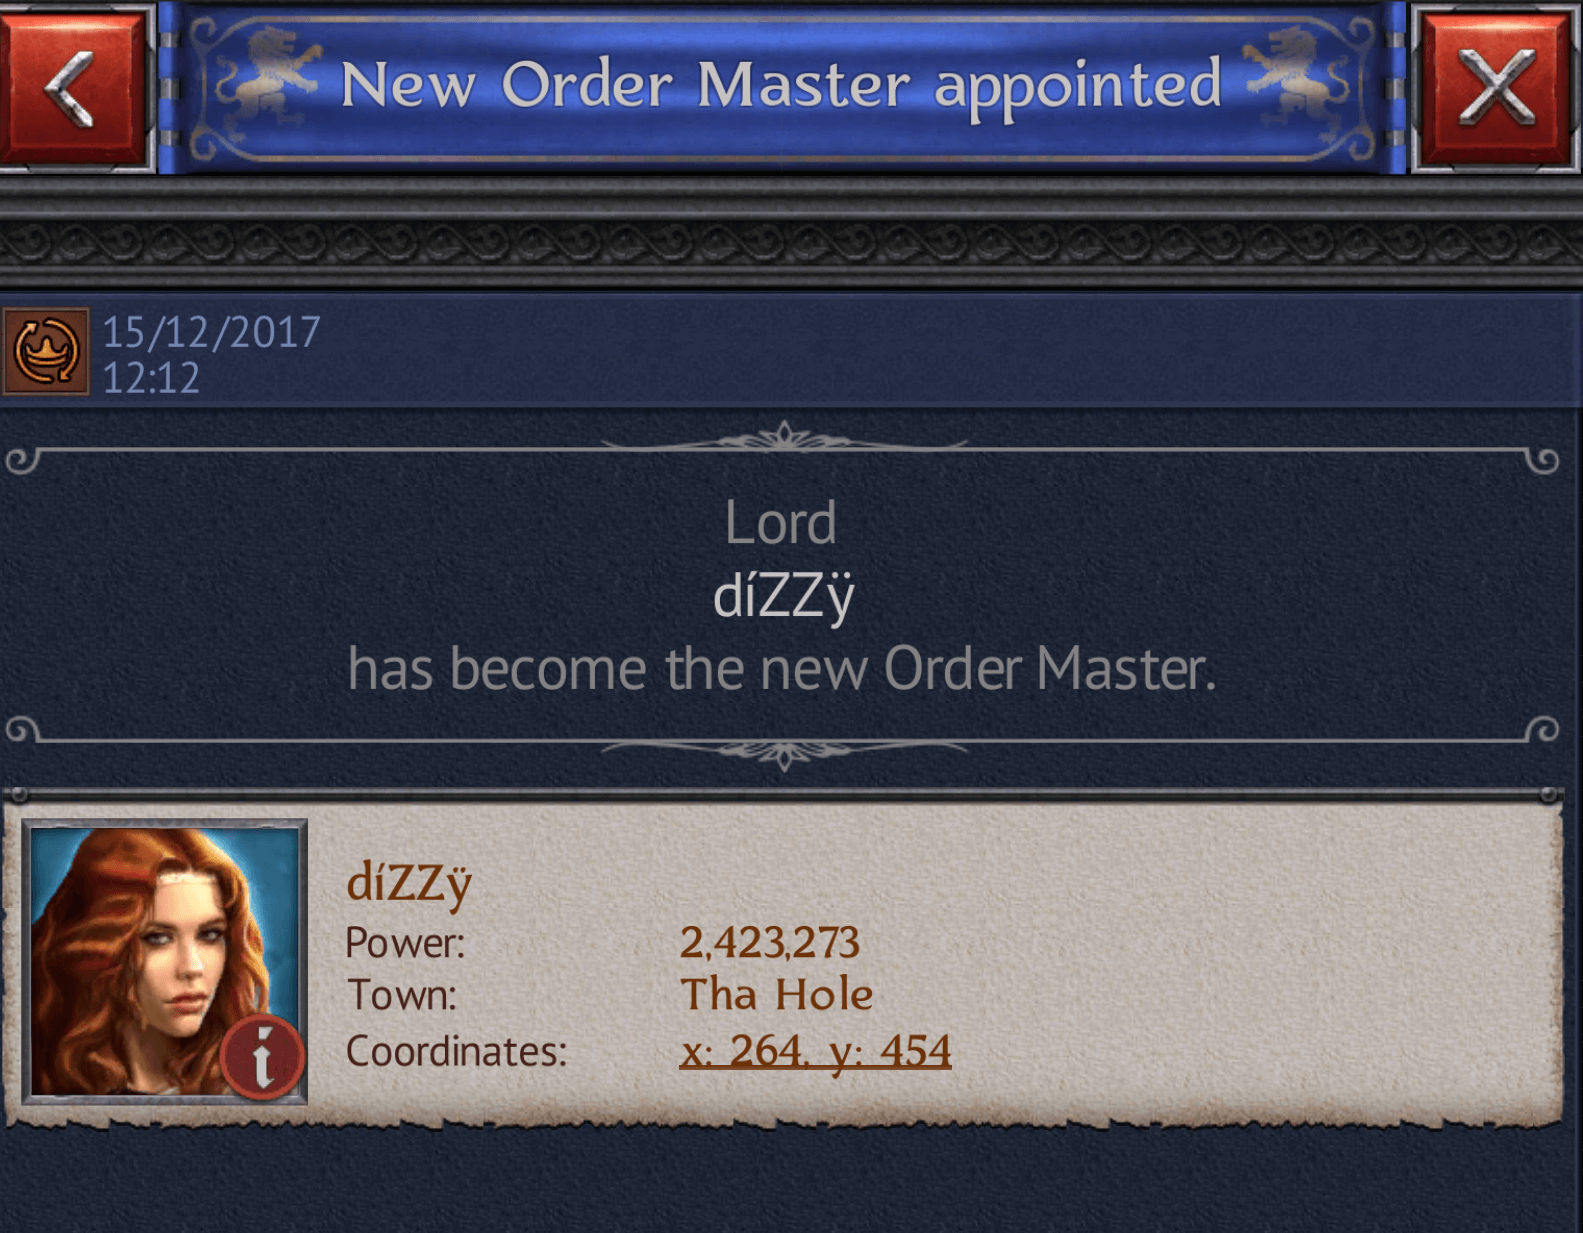 New Order Master